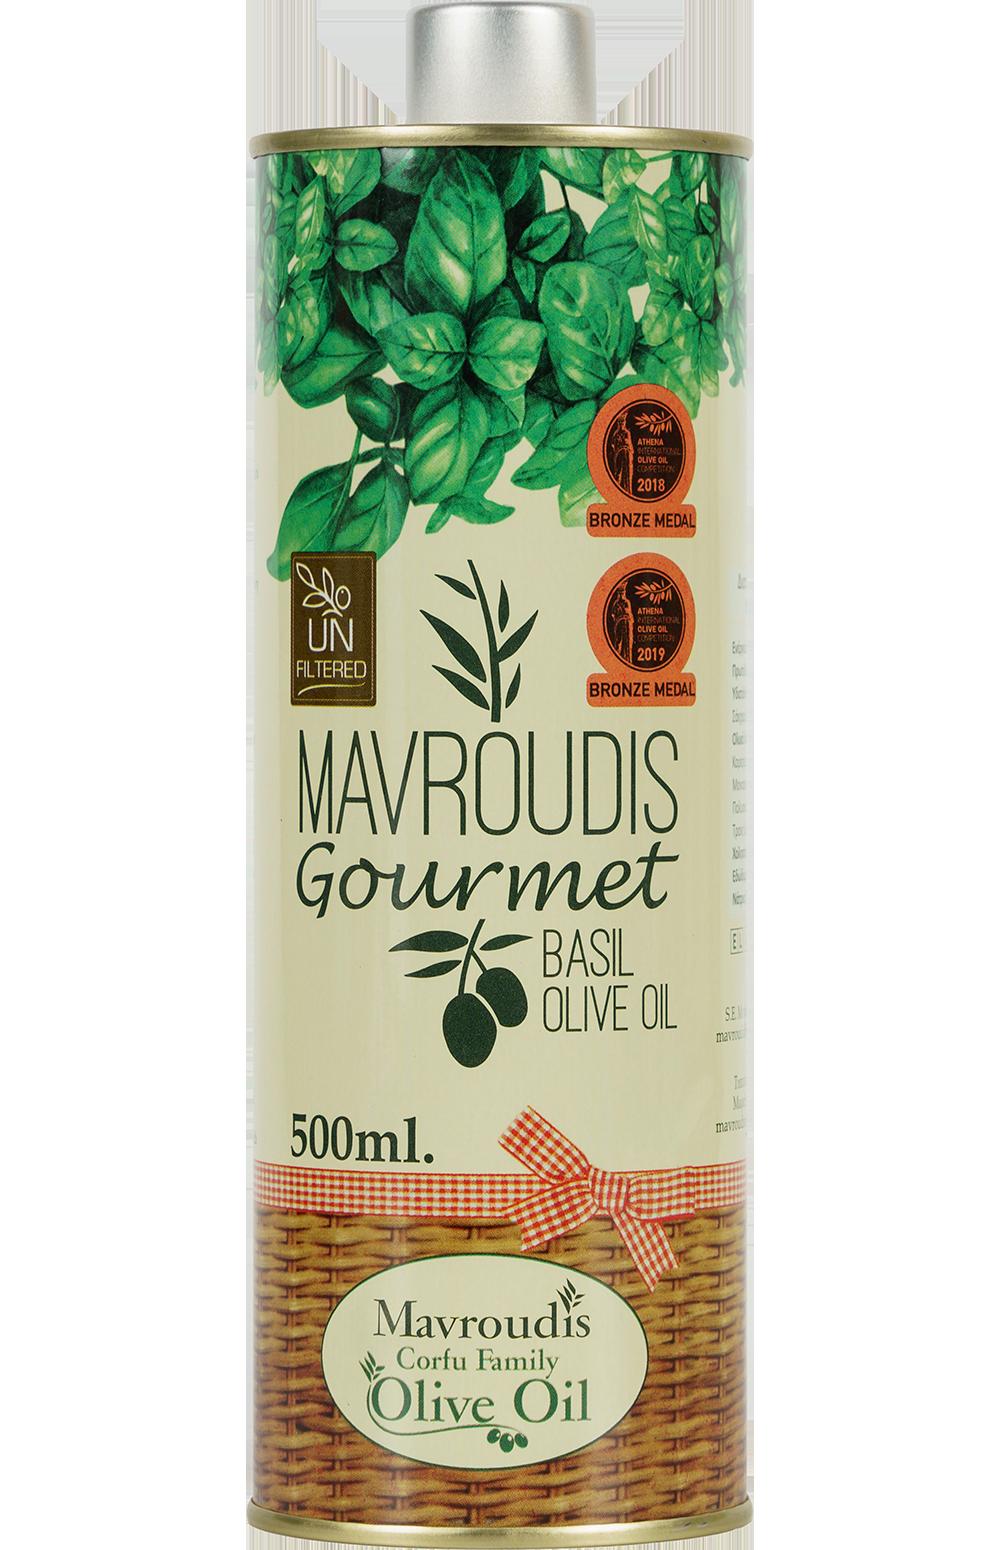 Mavroudis Gourmet Basil